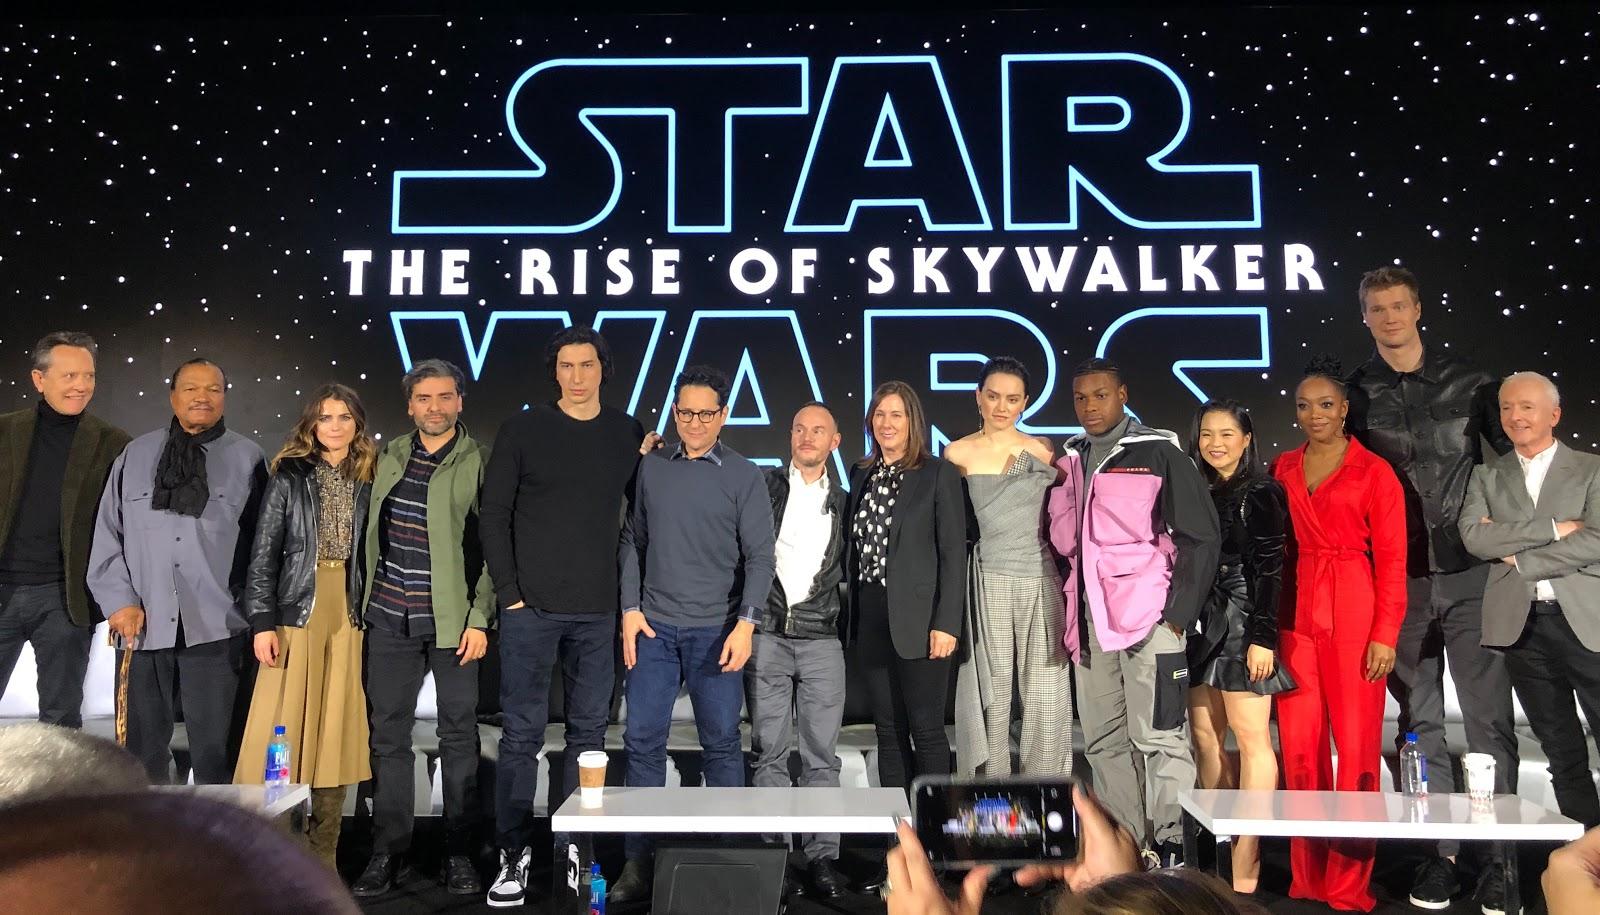 The Star Wars Underworld The Rise Of Skywalker Cast Crew Interviews